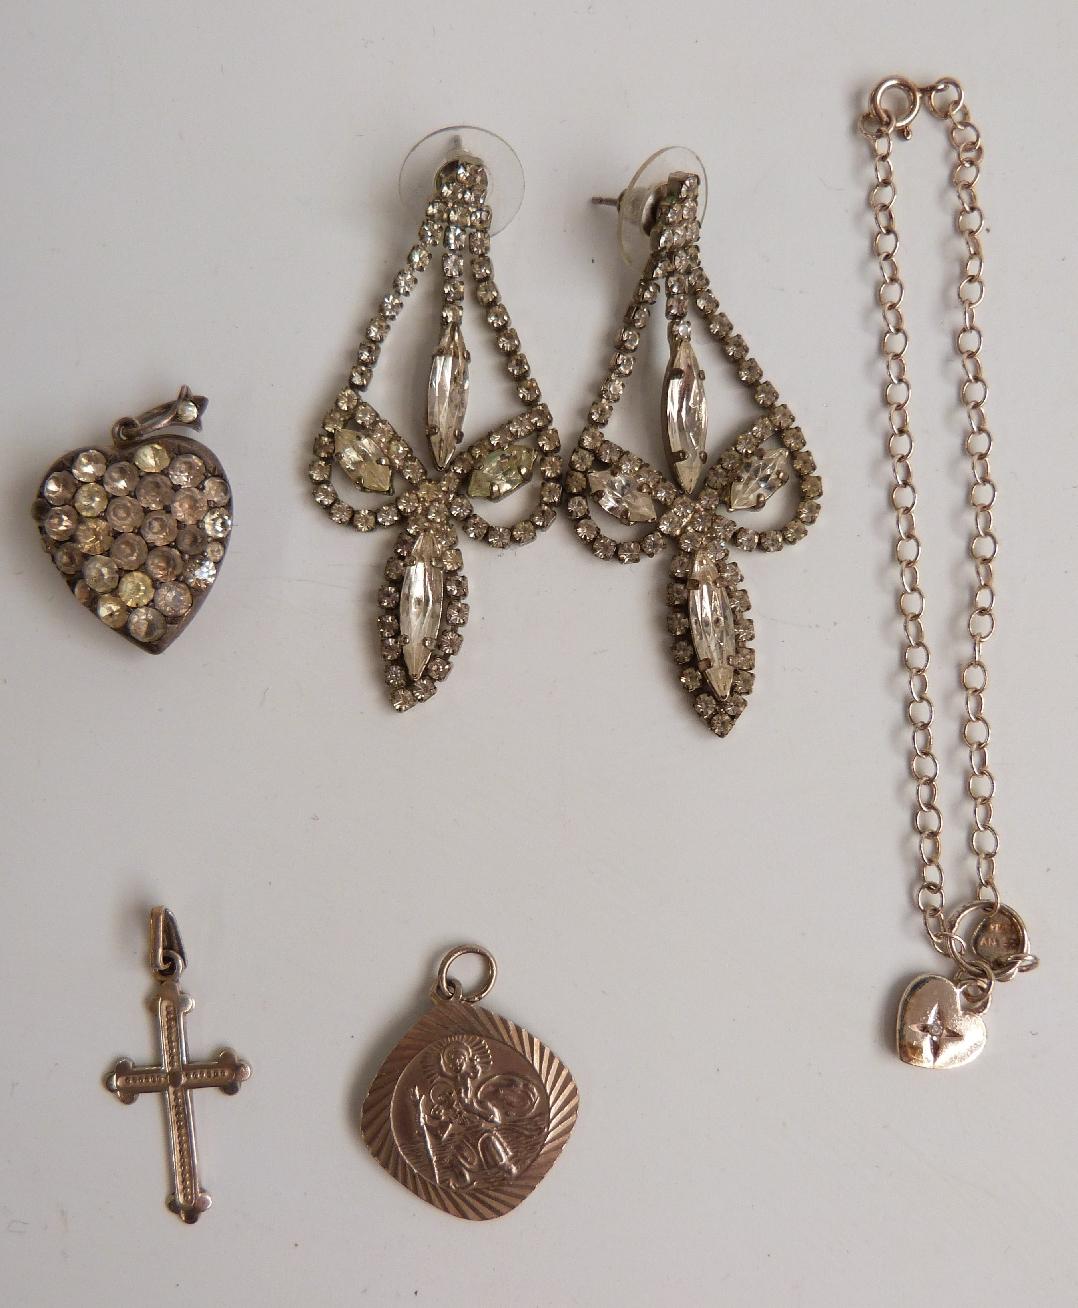 Lot 34 - A collection of costume jewellery including agate beads, diamanté earrings, De Farre bracelet,